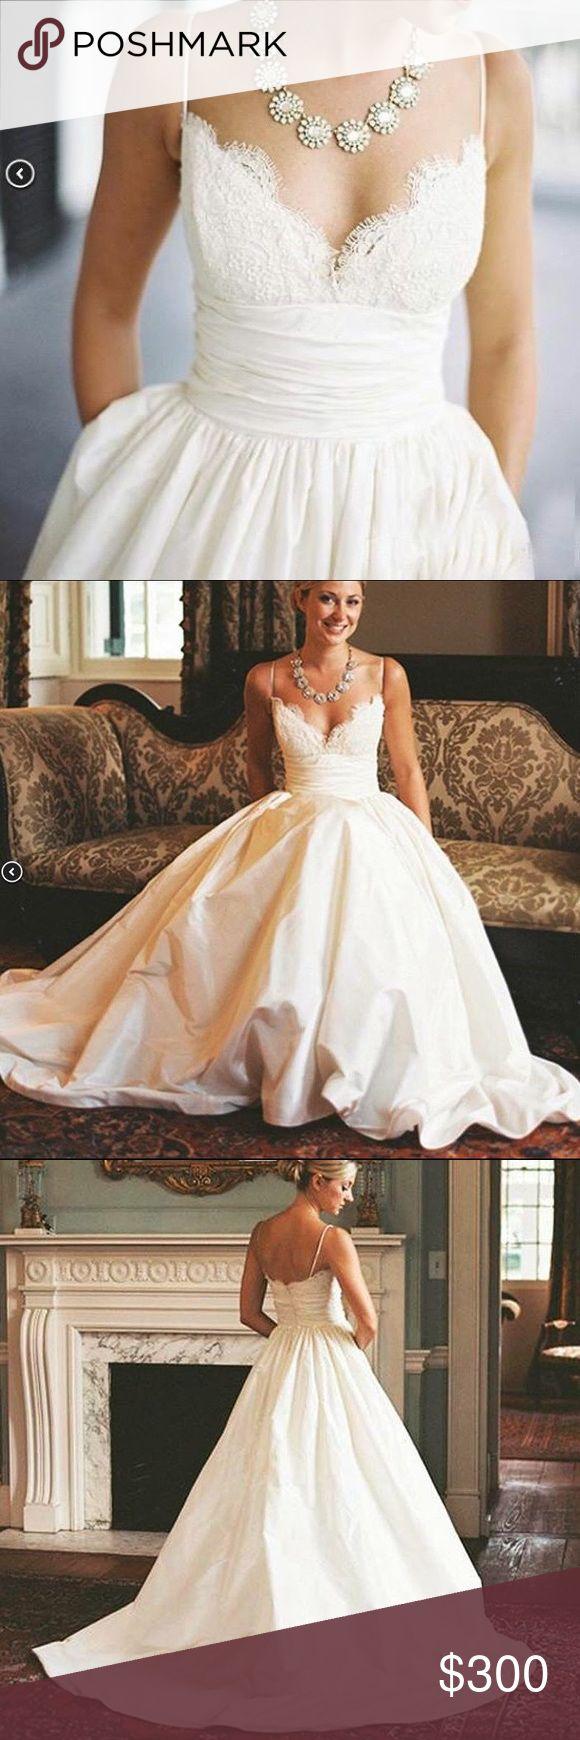 Best 25 taffeta wedding dresses ideas on pinterest ball for Amsale aberra wedding dresses